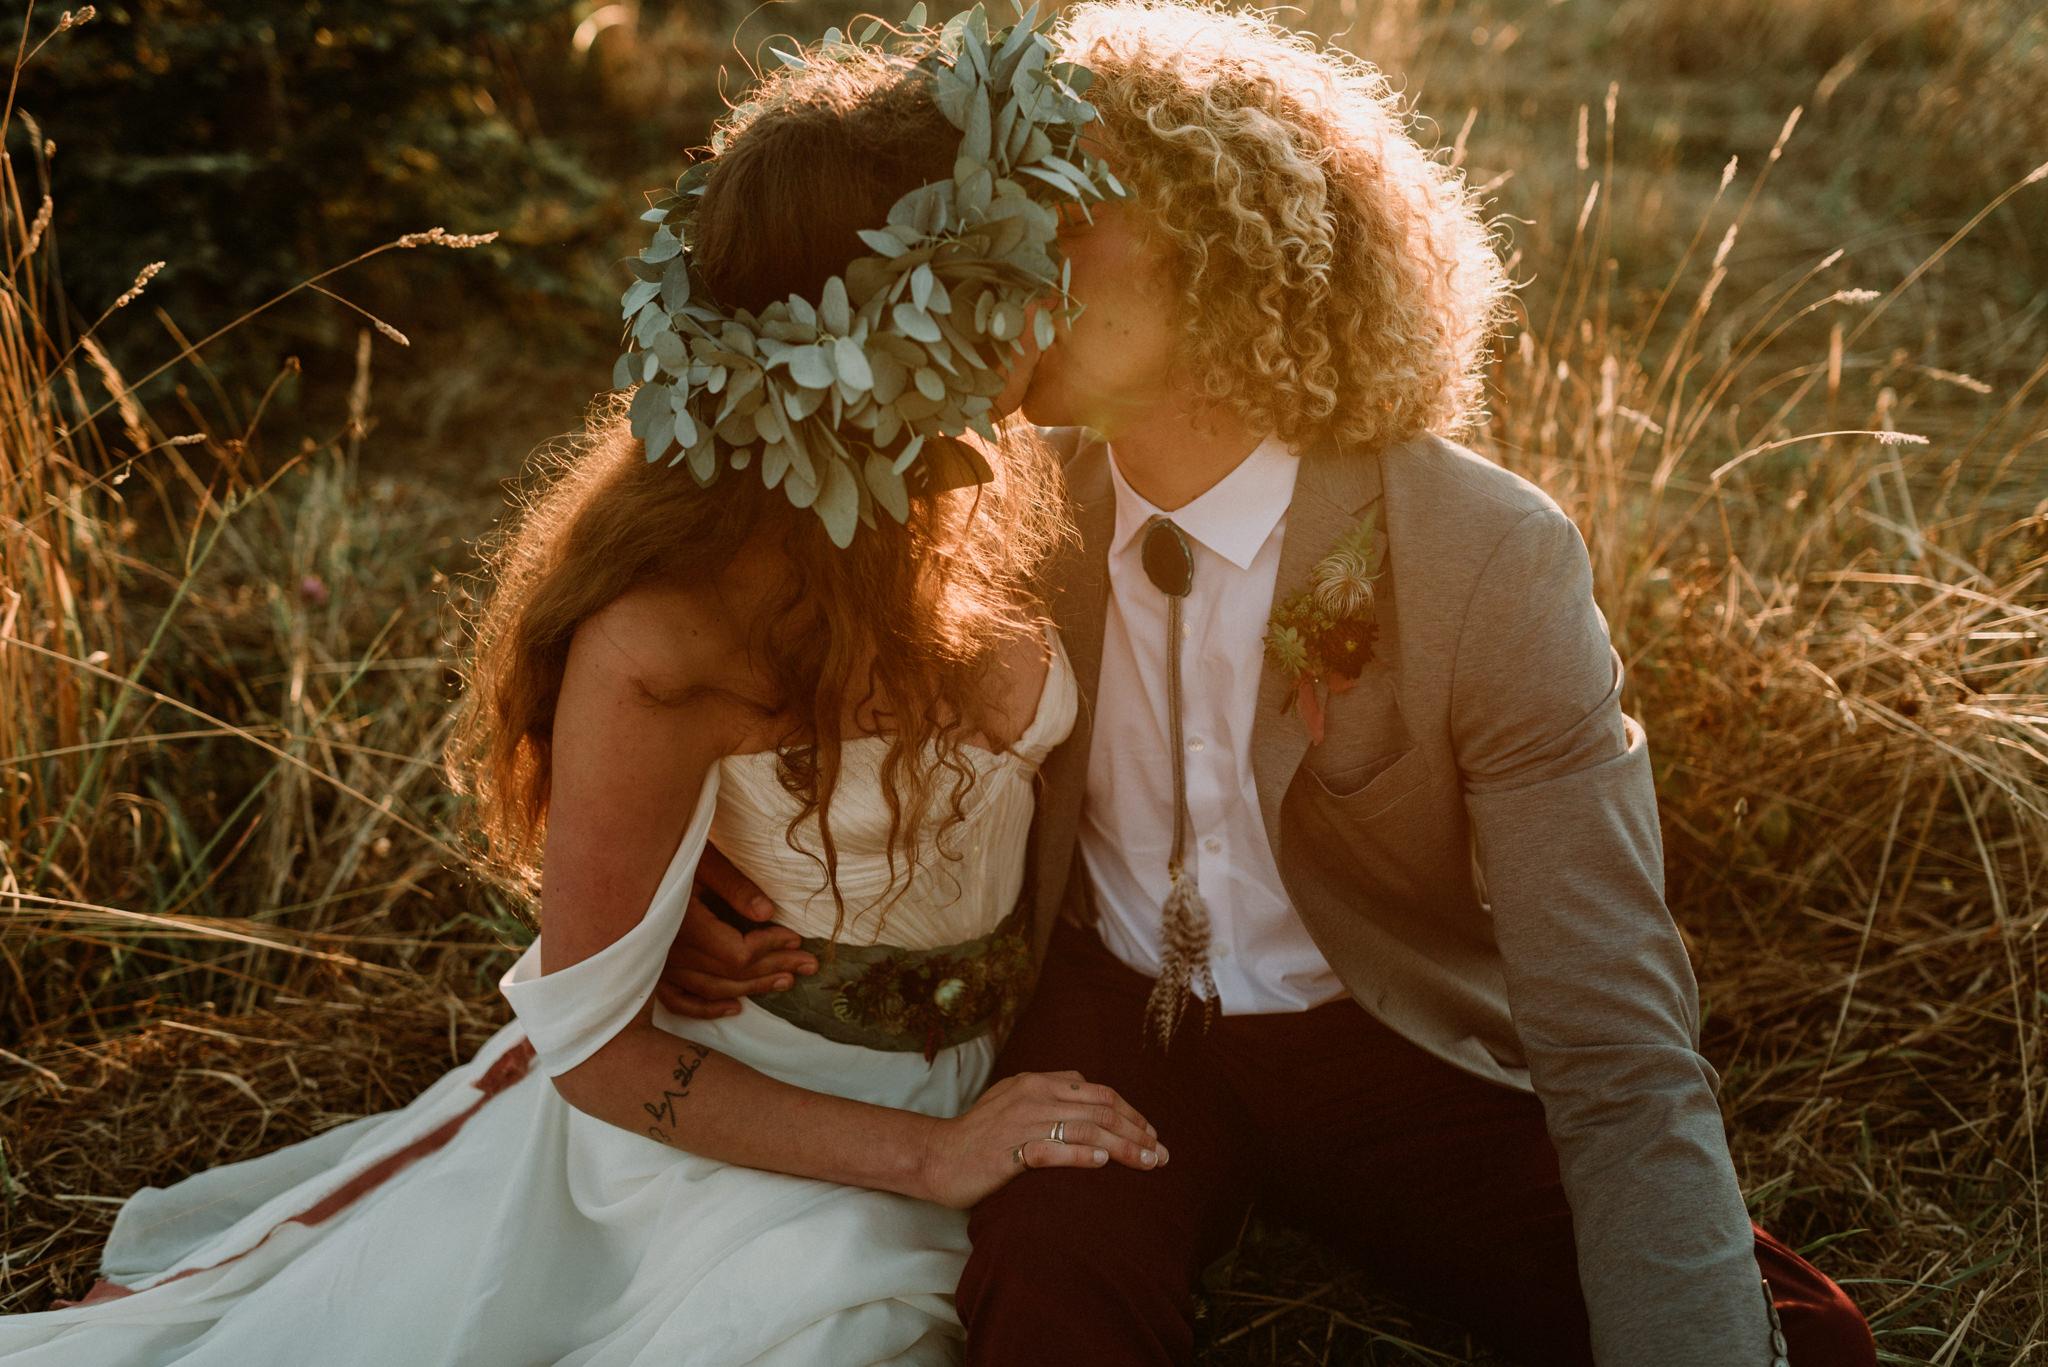 magical-bohemian-sunset-greenery-port-angeles-washington-forest-seaside-grassy-backyard-wedding-Kerlyn-Van-Gelder-Photography-Washington-Wedding-Photographer